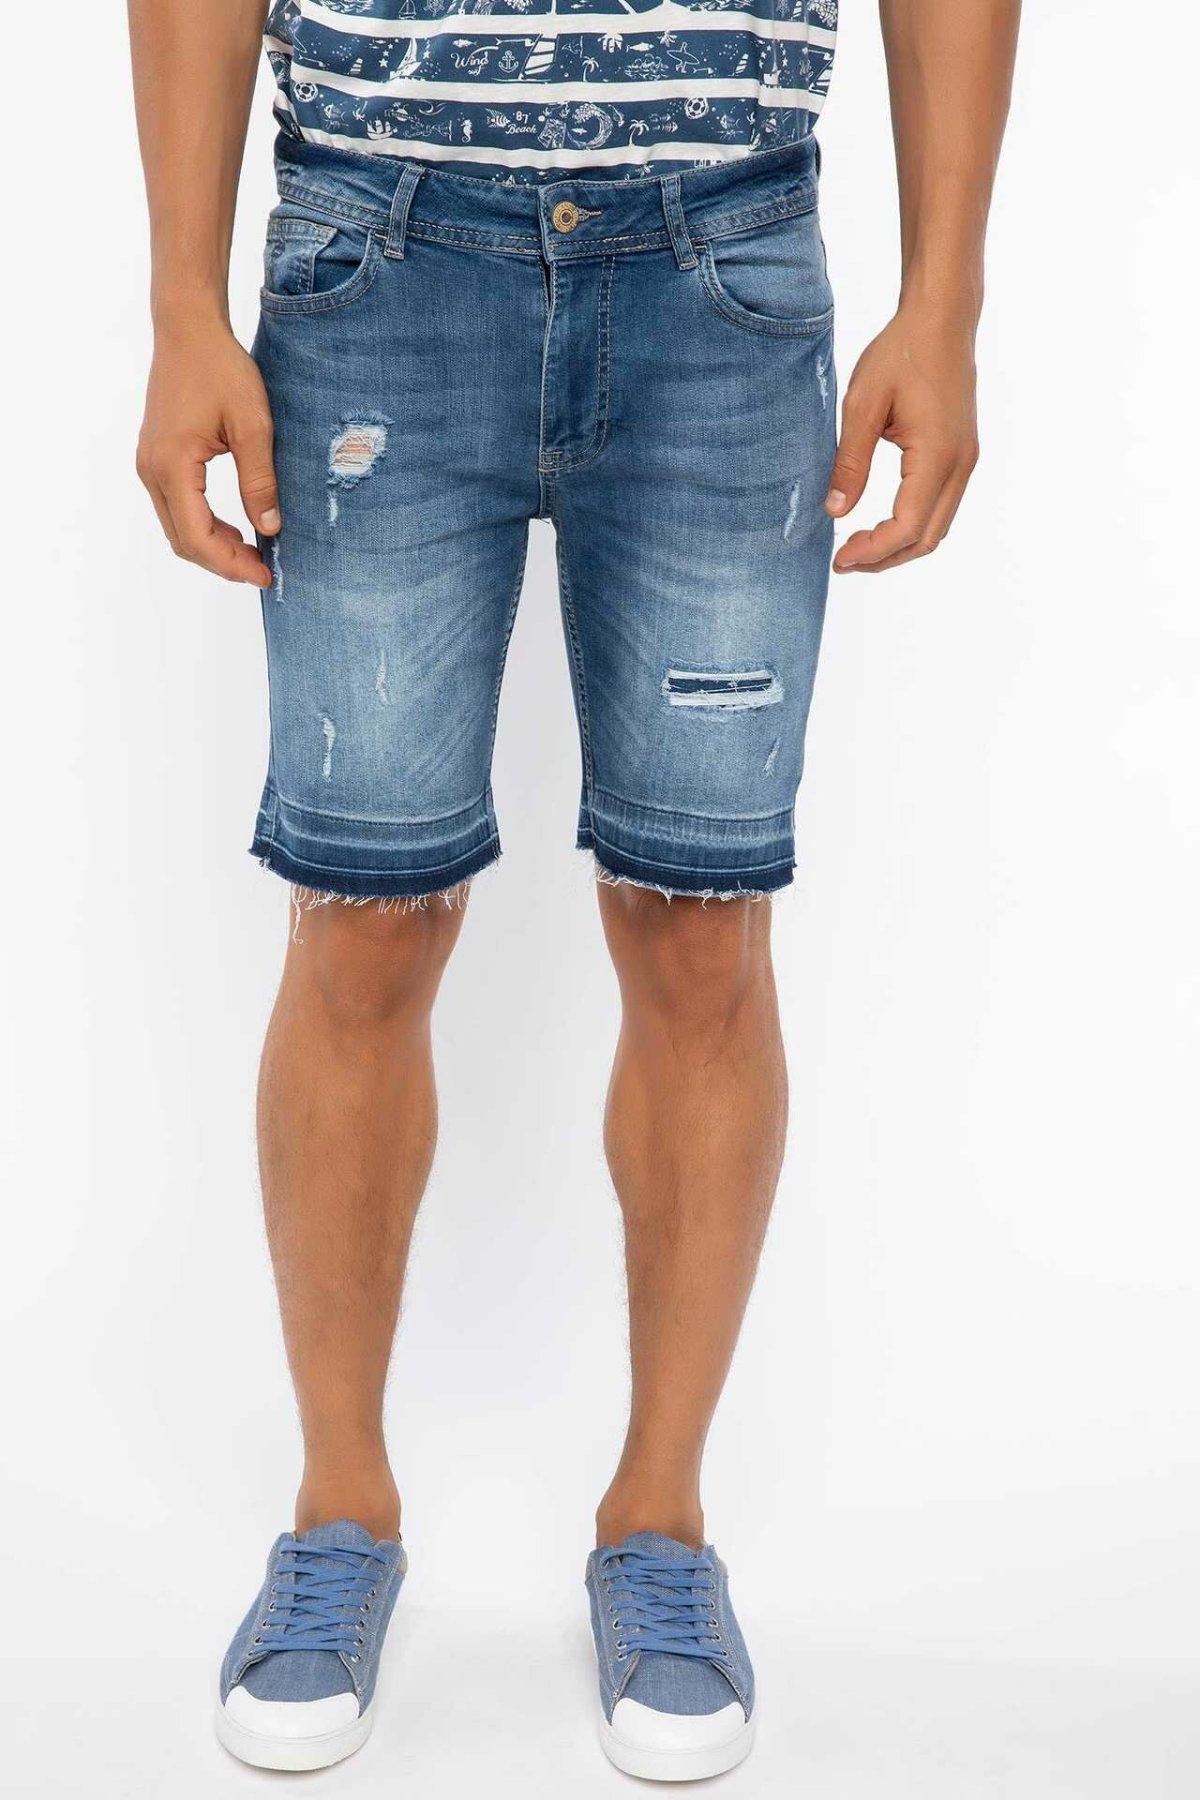 DeFacto Summer Men Ripped Holes Denim Shorts Sky Blue Washed Short Denim Jeans Bermuda I8988AZ18HSNM28-I8988AZ18HS